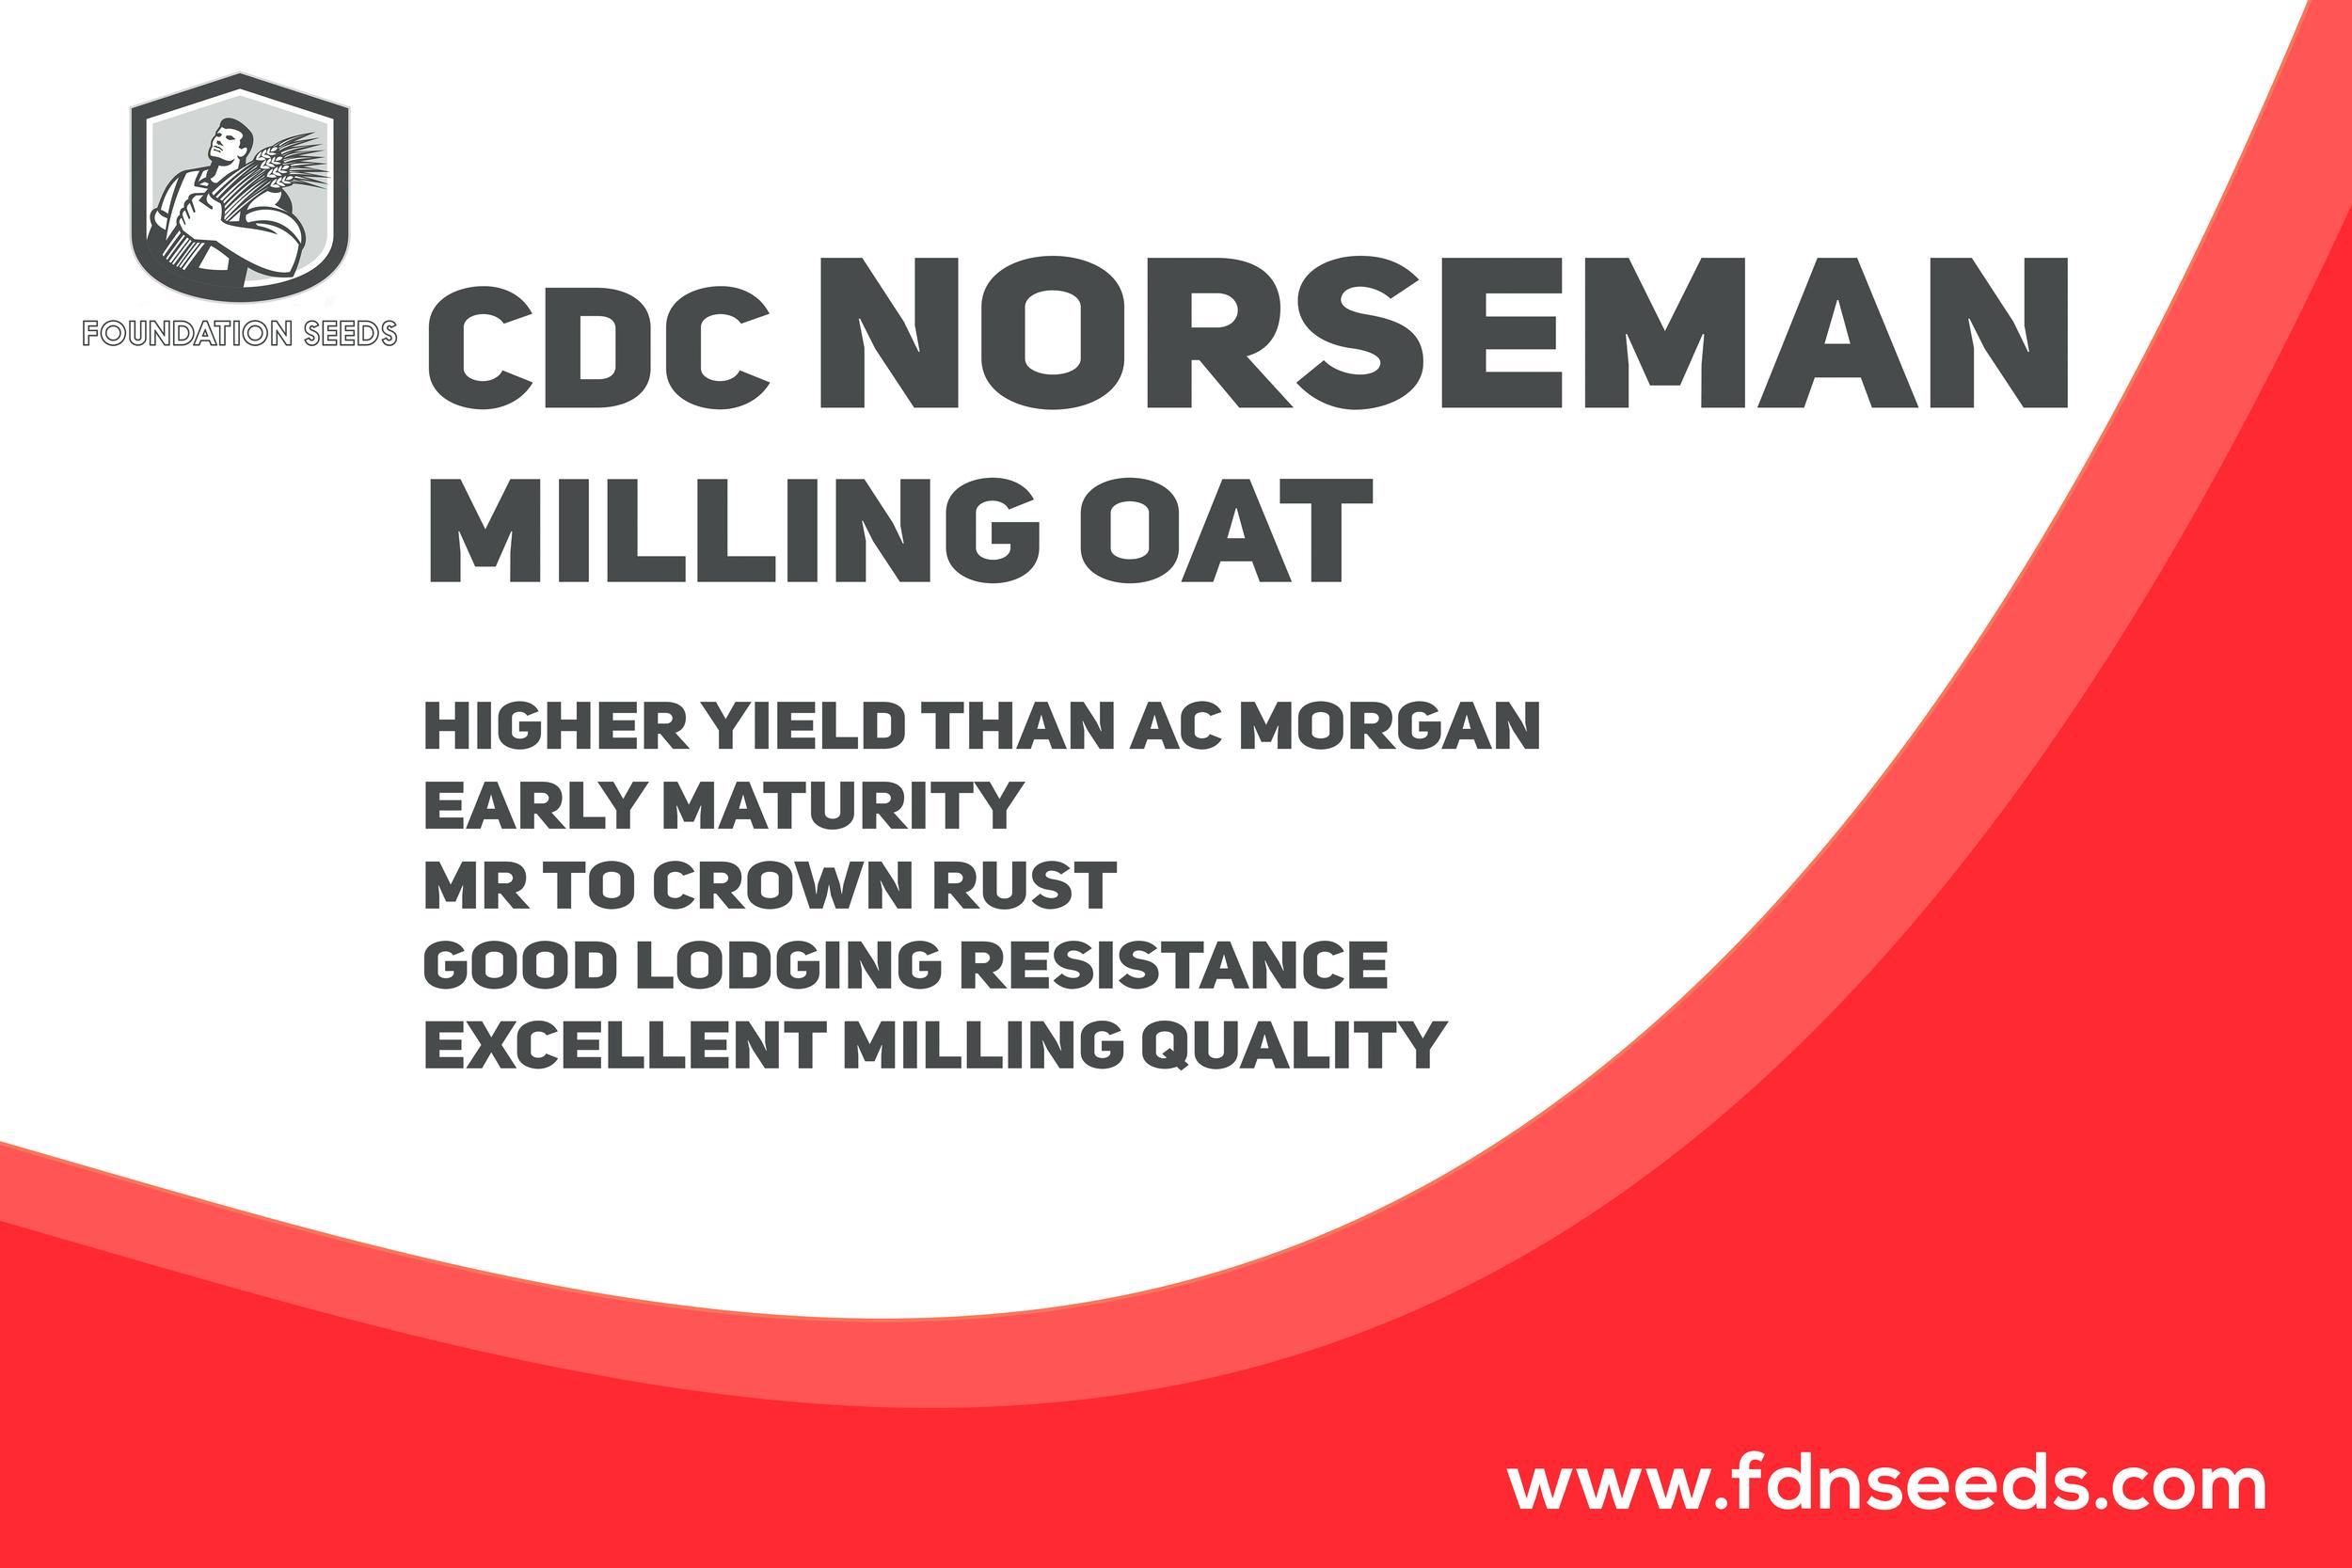 CDC Norseman Milling Oat